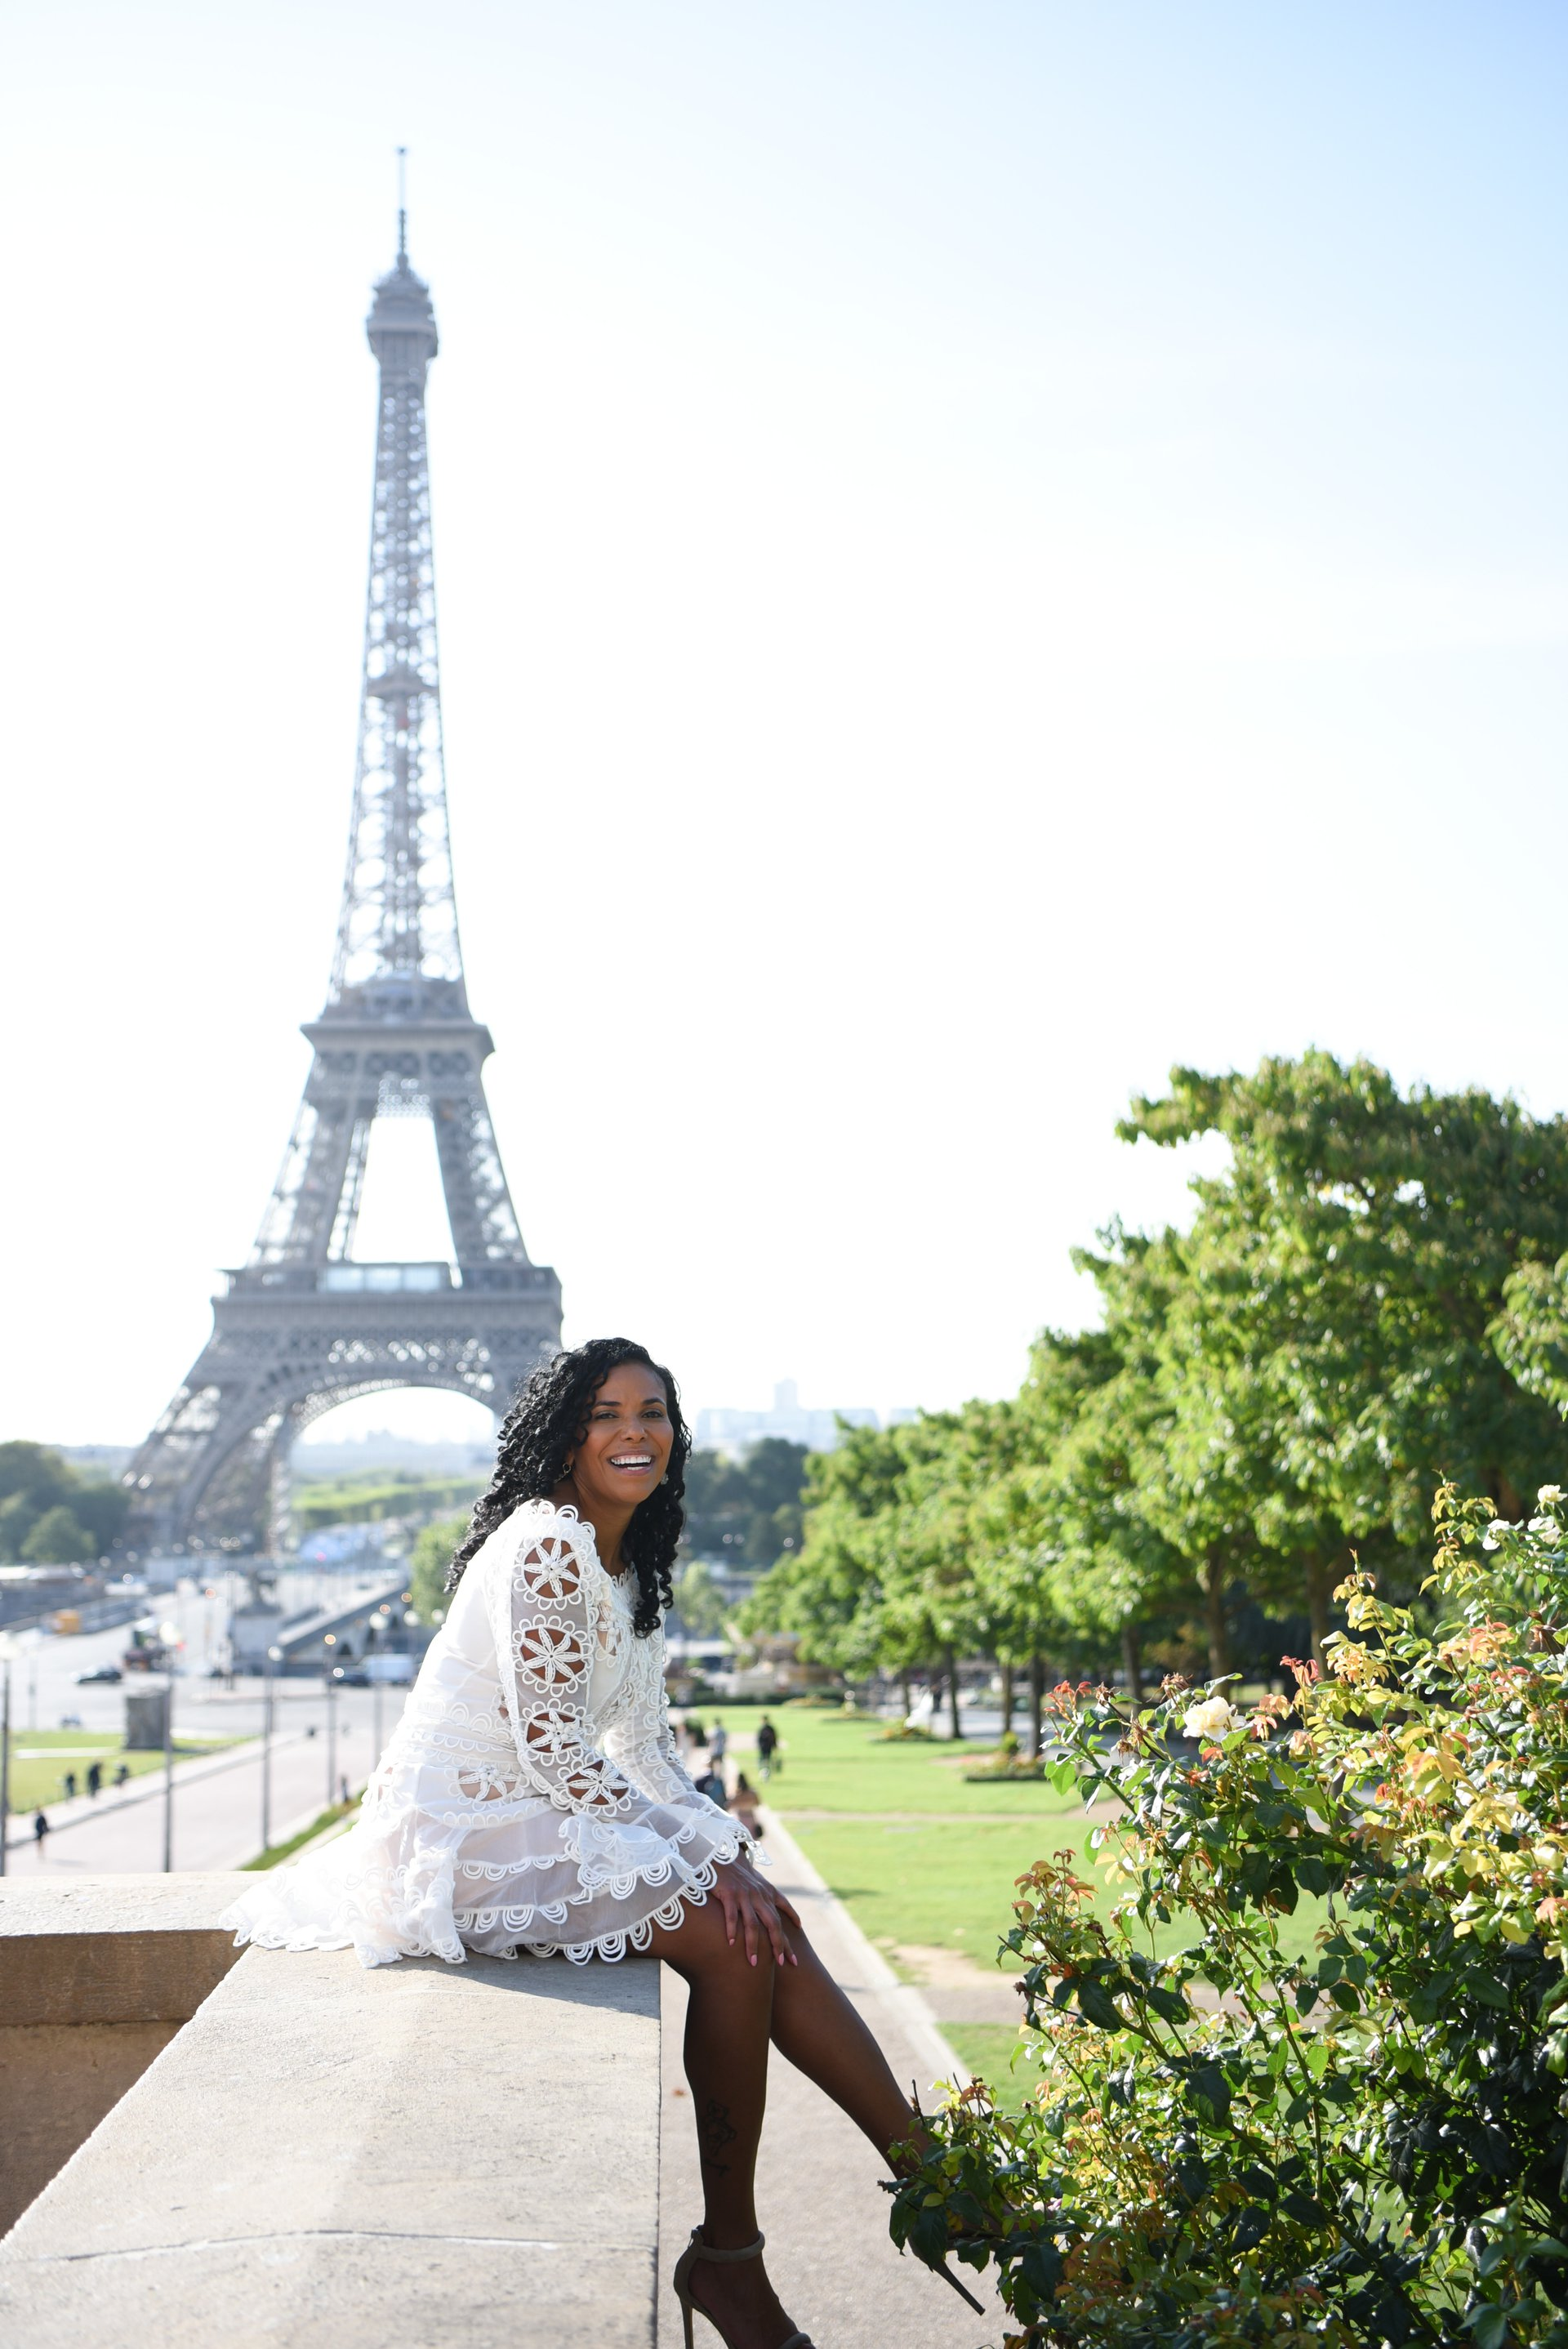 Paris-France-travel-story-Flytographer-4